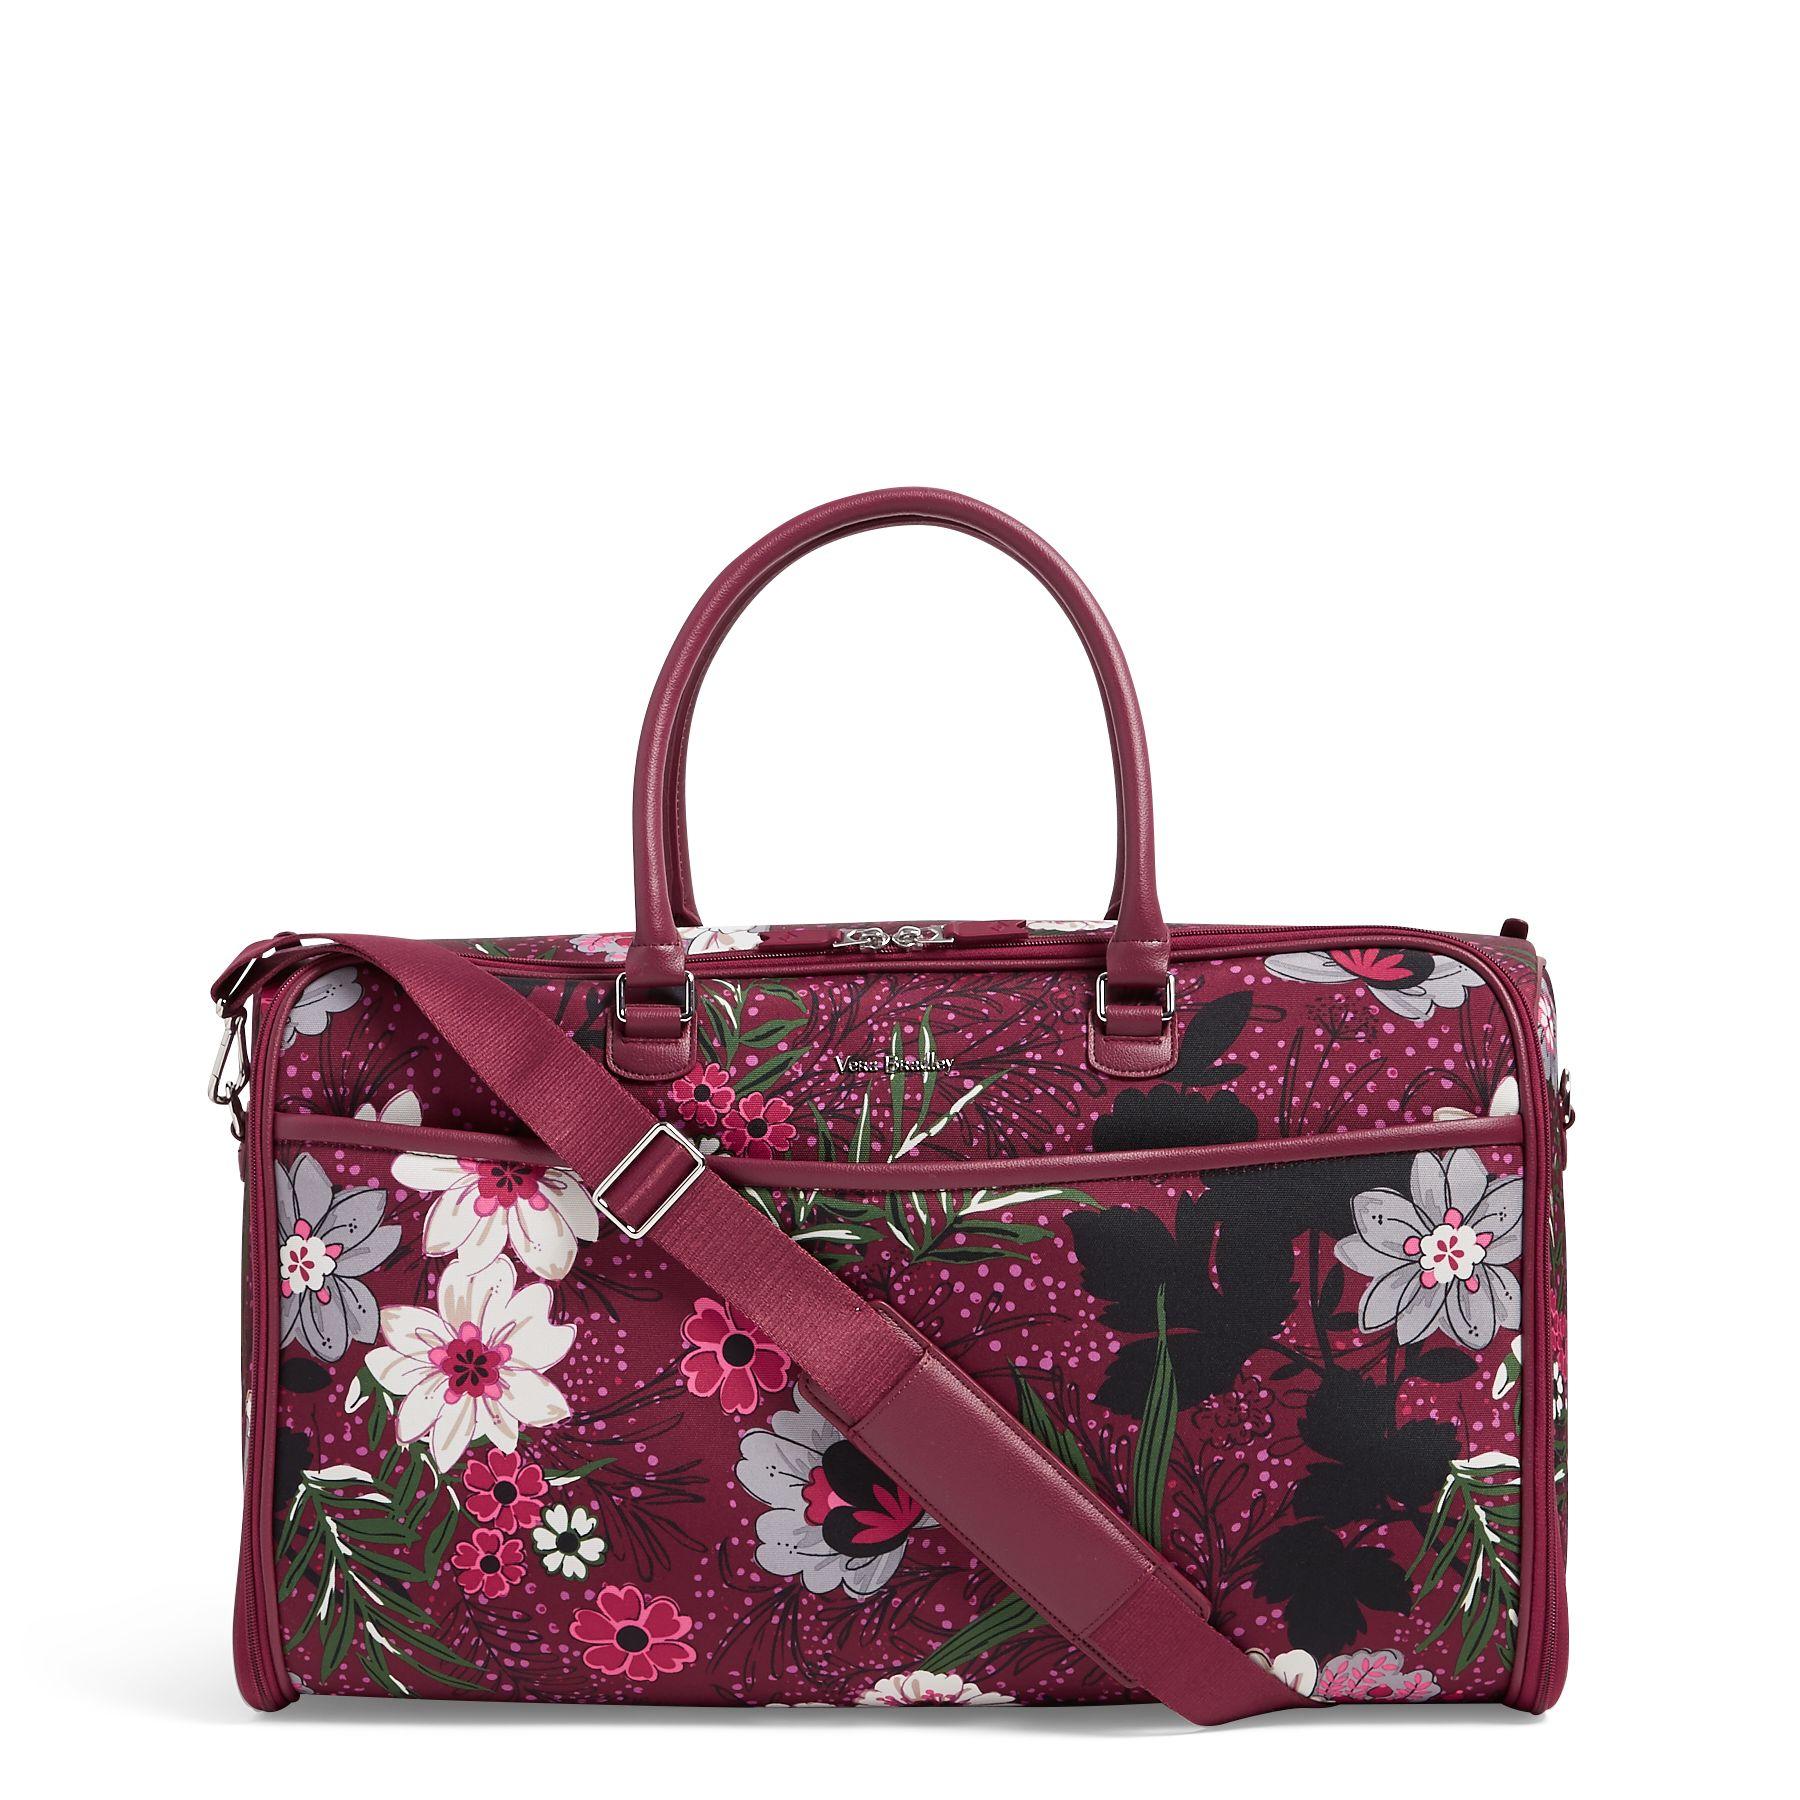 c0889792f8 Iconic Convertible Garment Bag